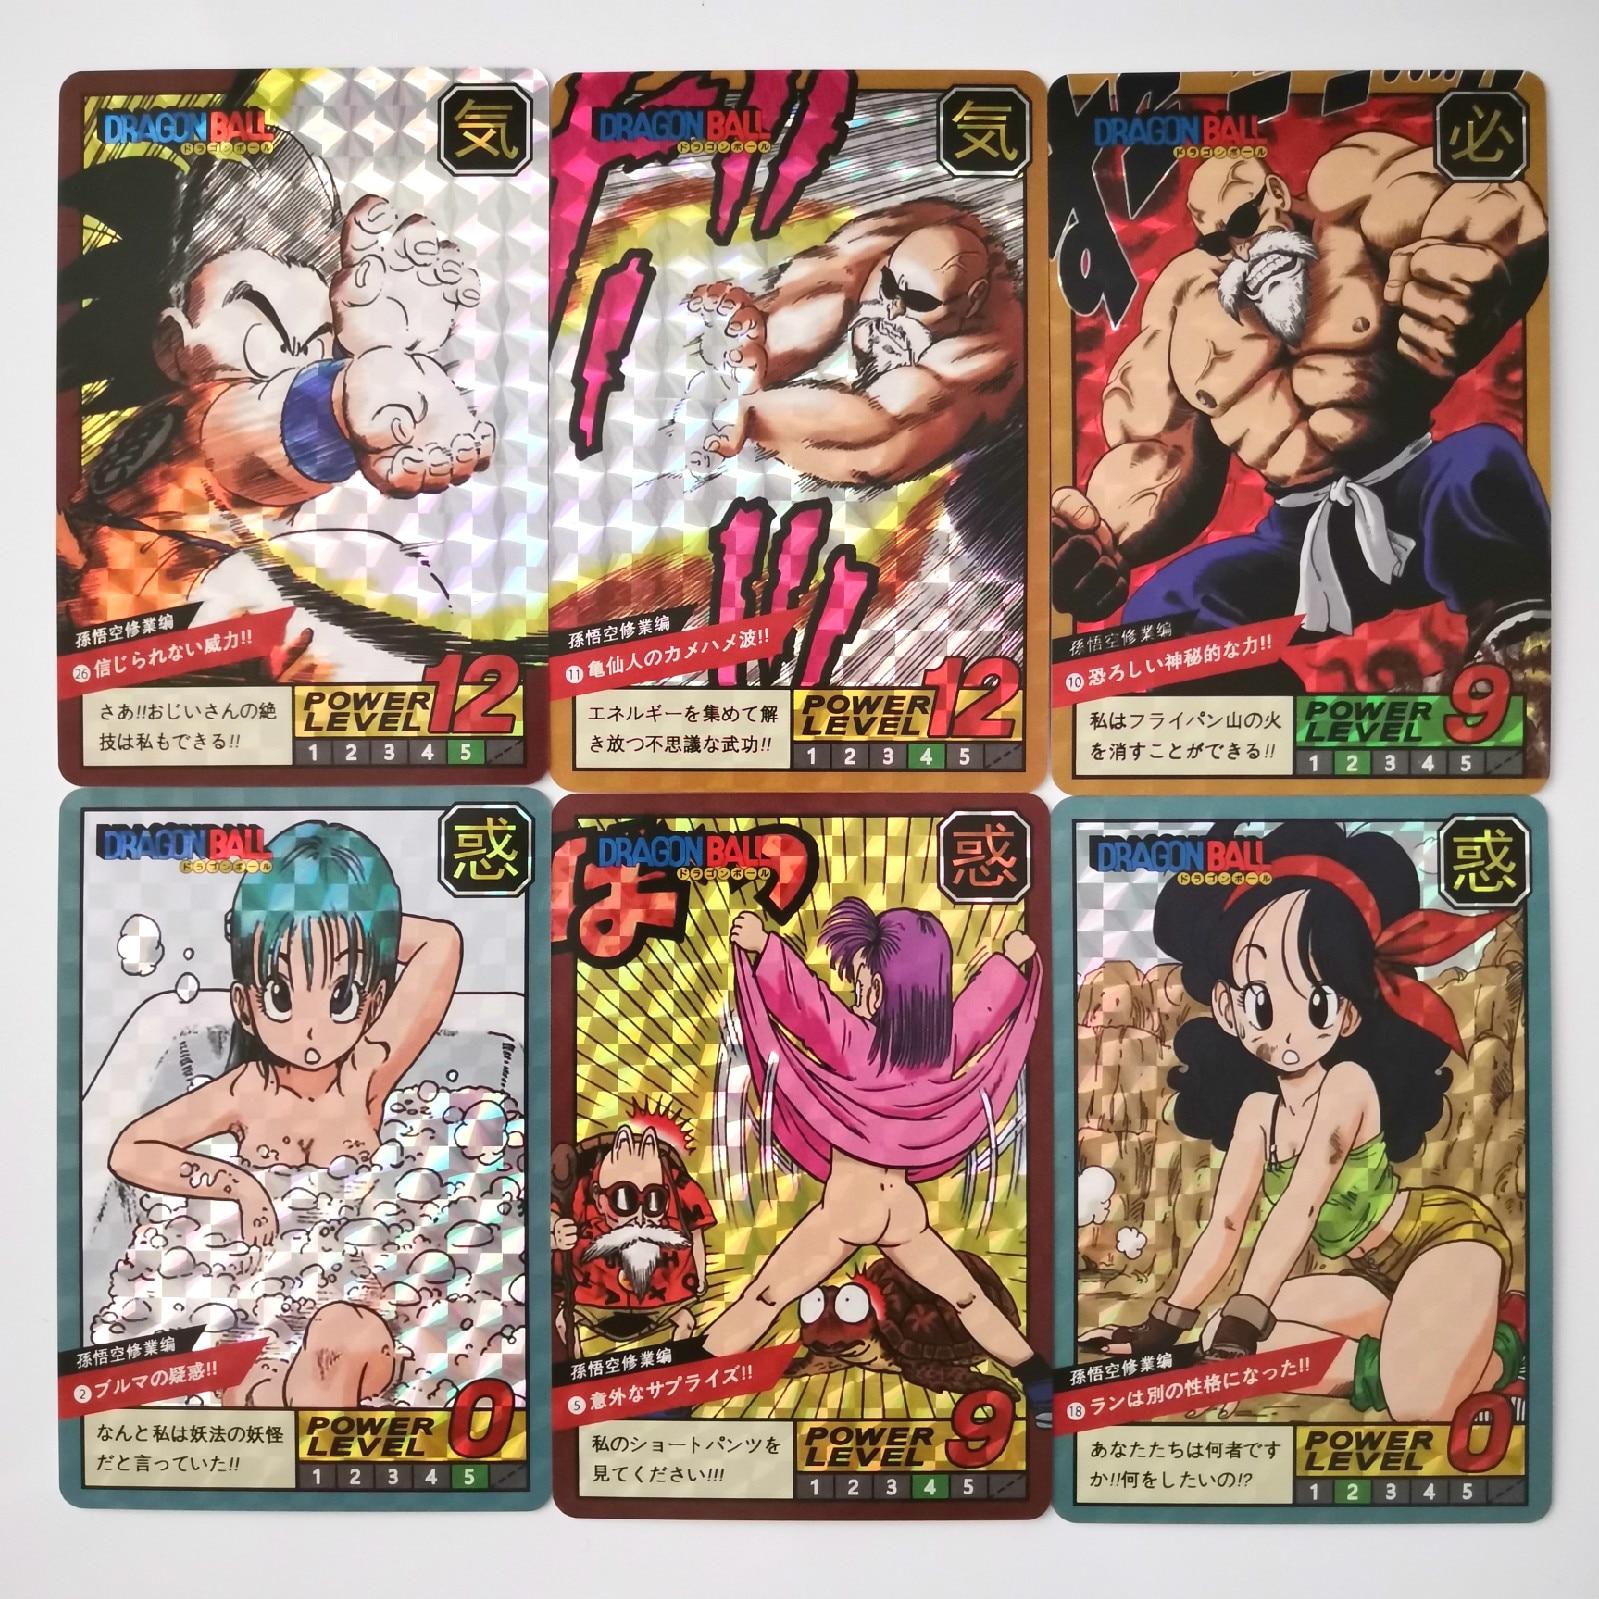 40 pz/set Super Dragon Ball Heroes Carta Battaglia Ultra Istinto Goku Vegeta Super Game Collection Carte40 pz/set Super Dragon Ball Heroes Carta Battaglia Ultra Istinto Goku Vegeta Super Game Collection Carte